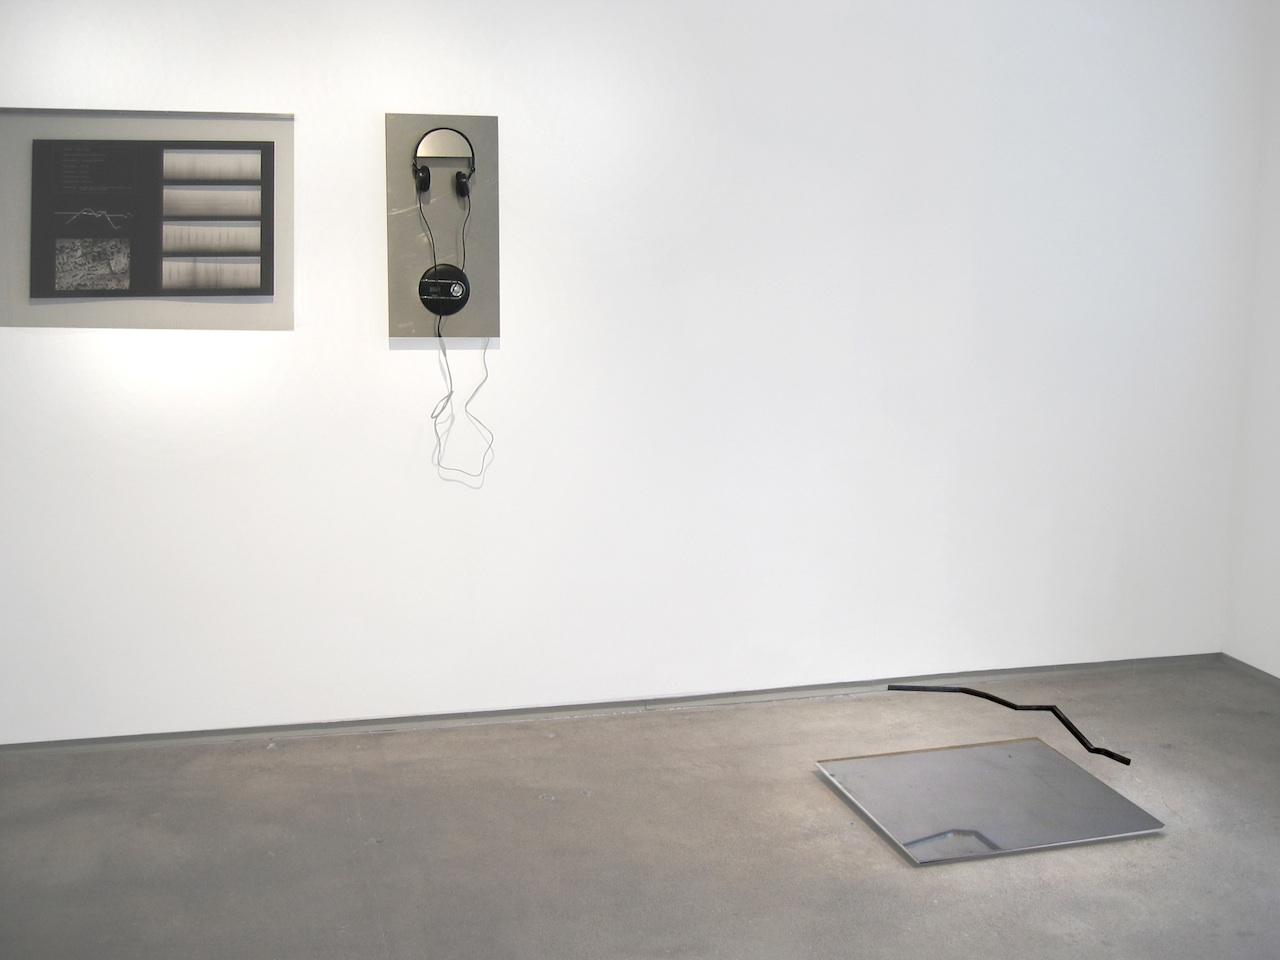 Walk of Shame, installed Kim Foster Gallery